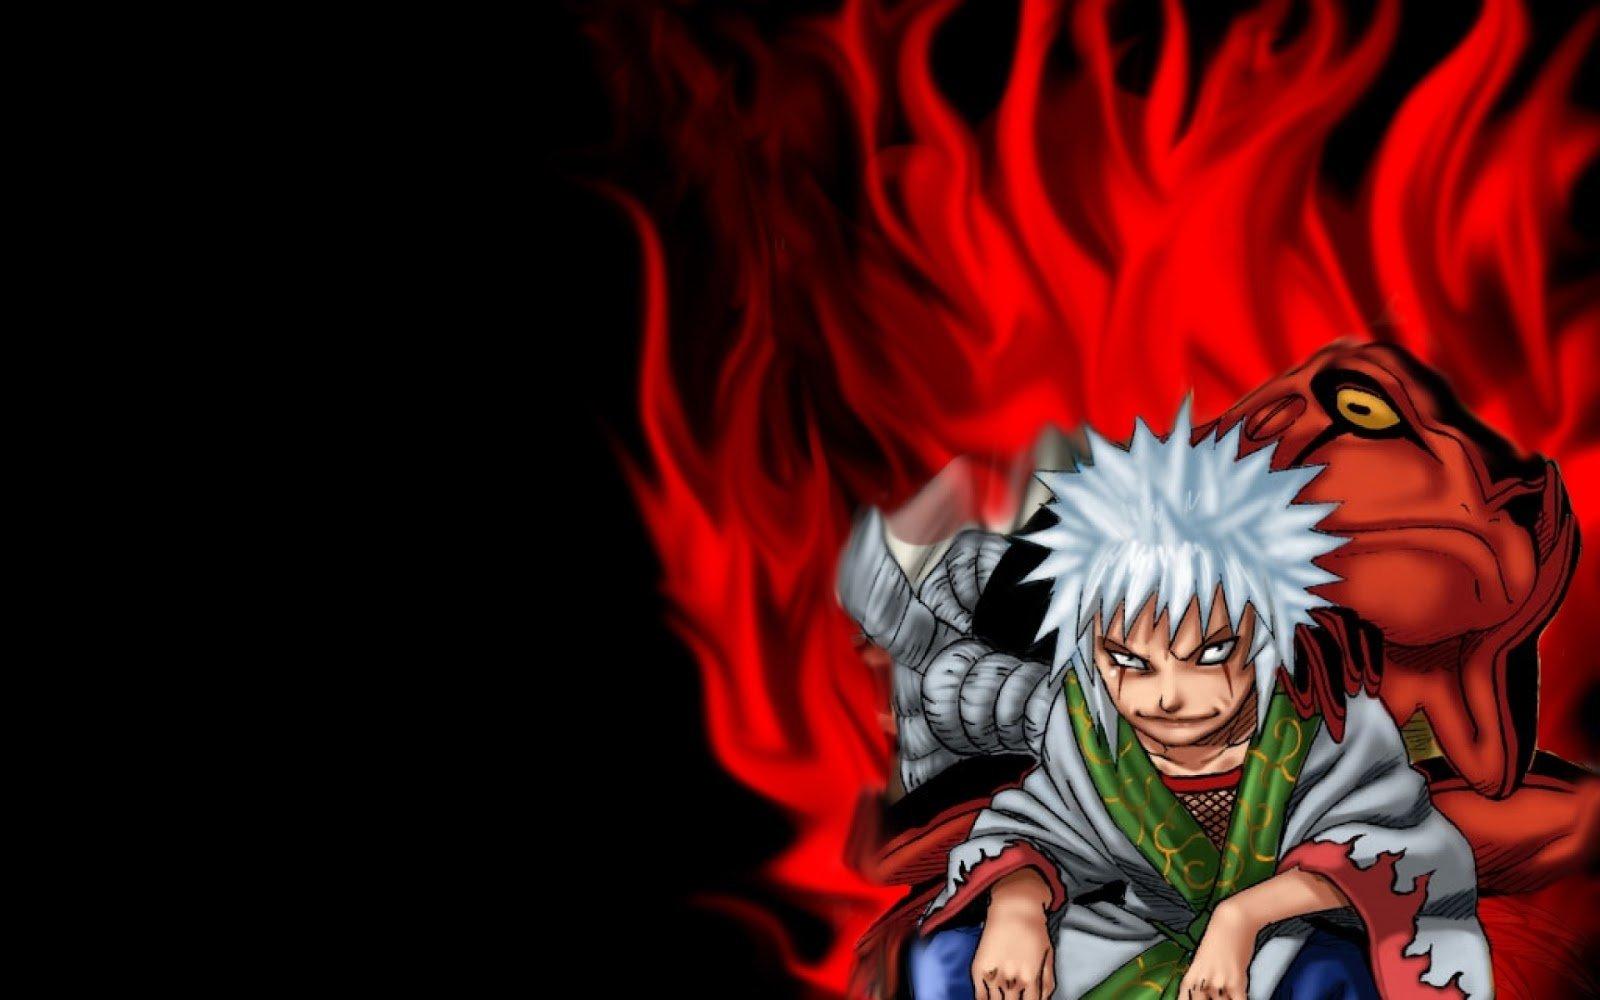 Cool Naruto Wallpapers - WallpaperSafari